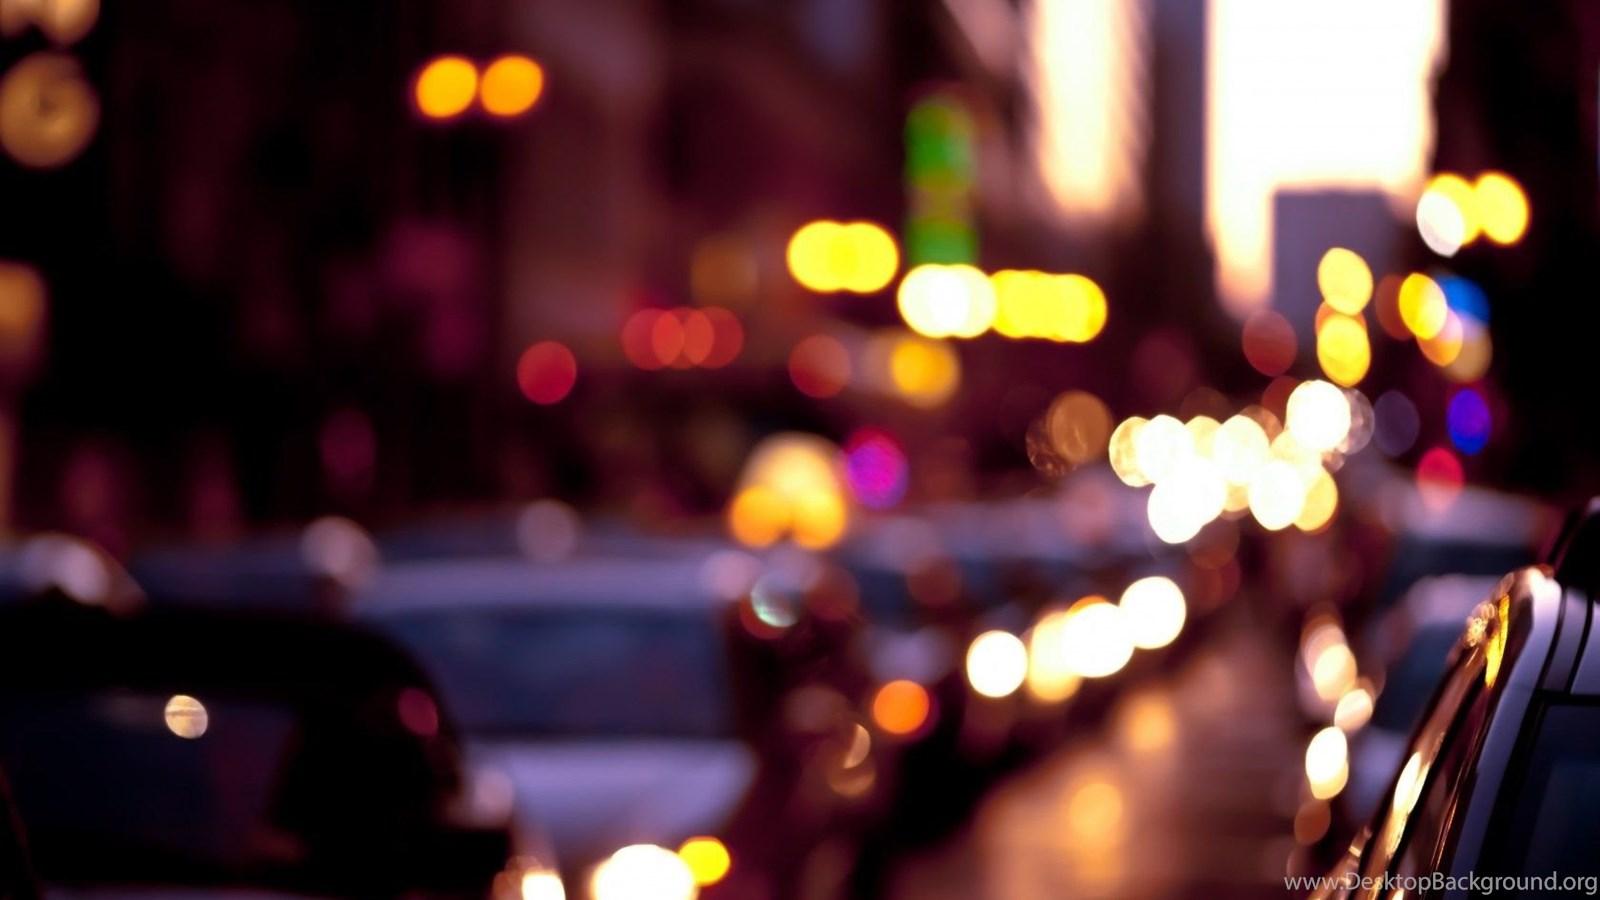 Bokeh city lights photo fanciful evening hd wallpapers desktop background - Light night wallpaper ...